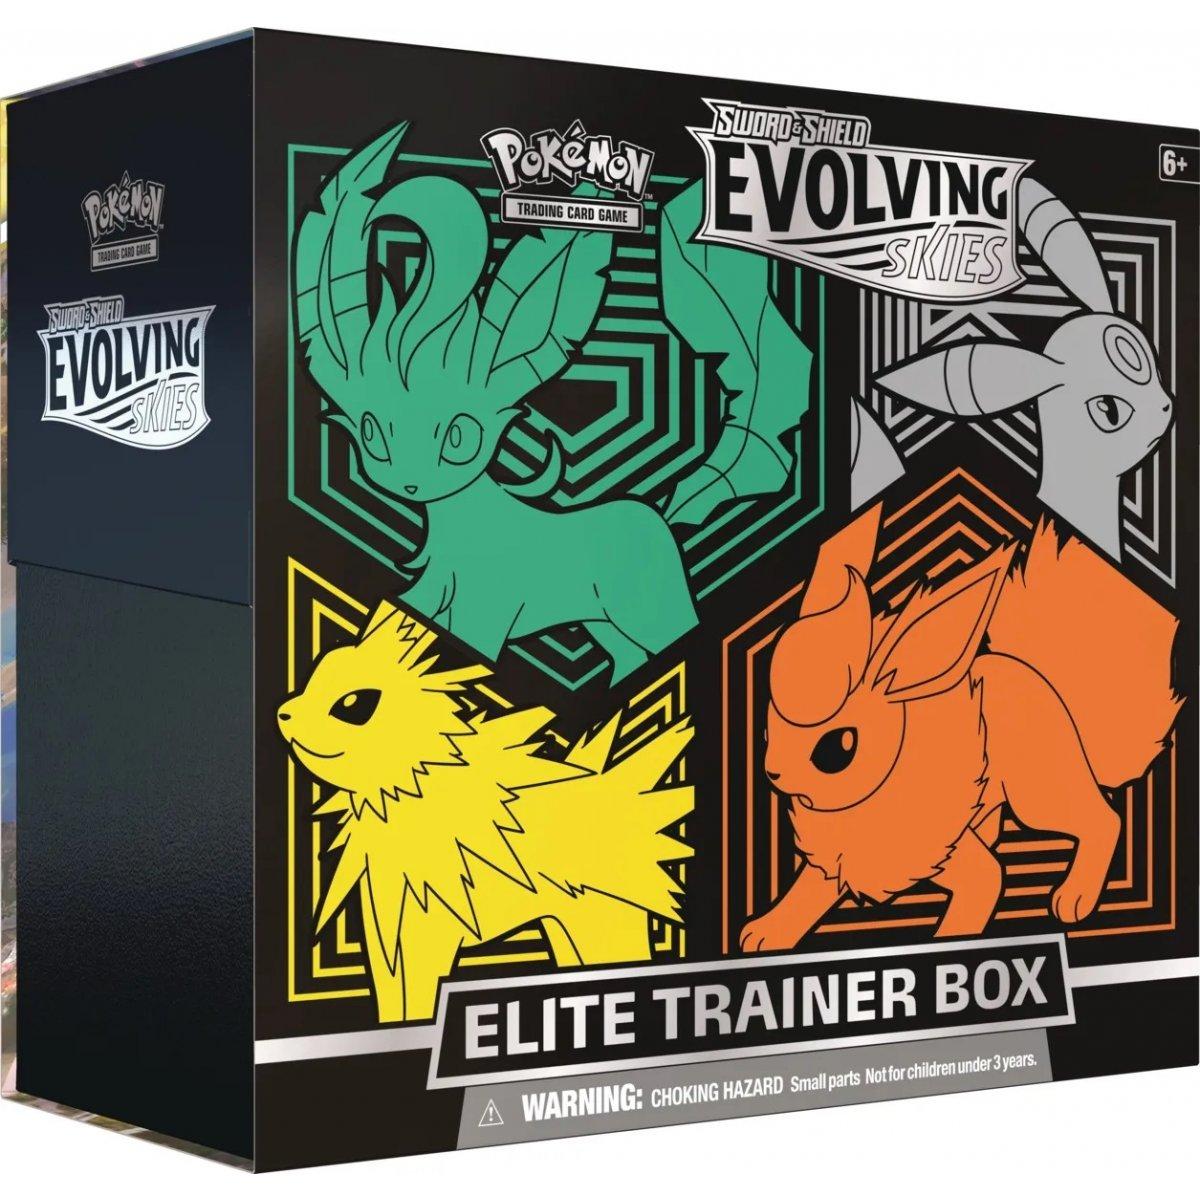 Pokémon - Evolving Skies Elite Trainer Box